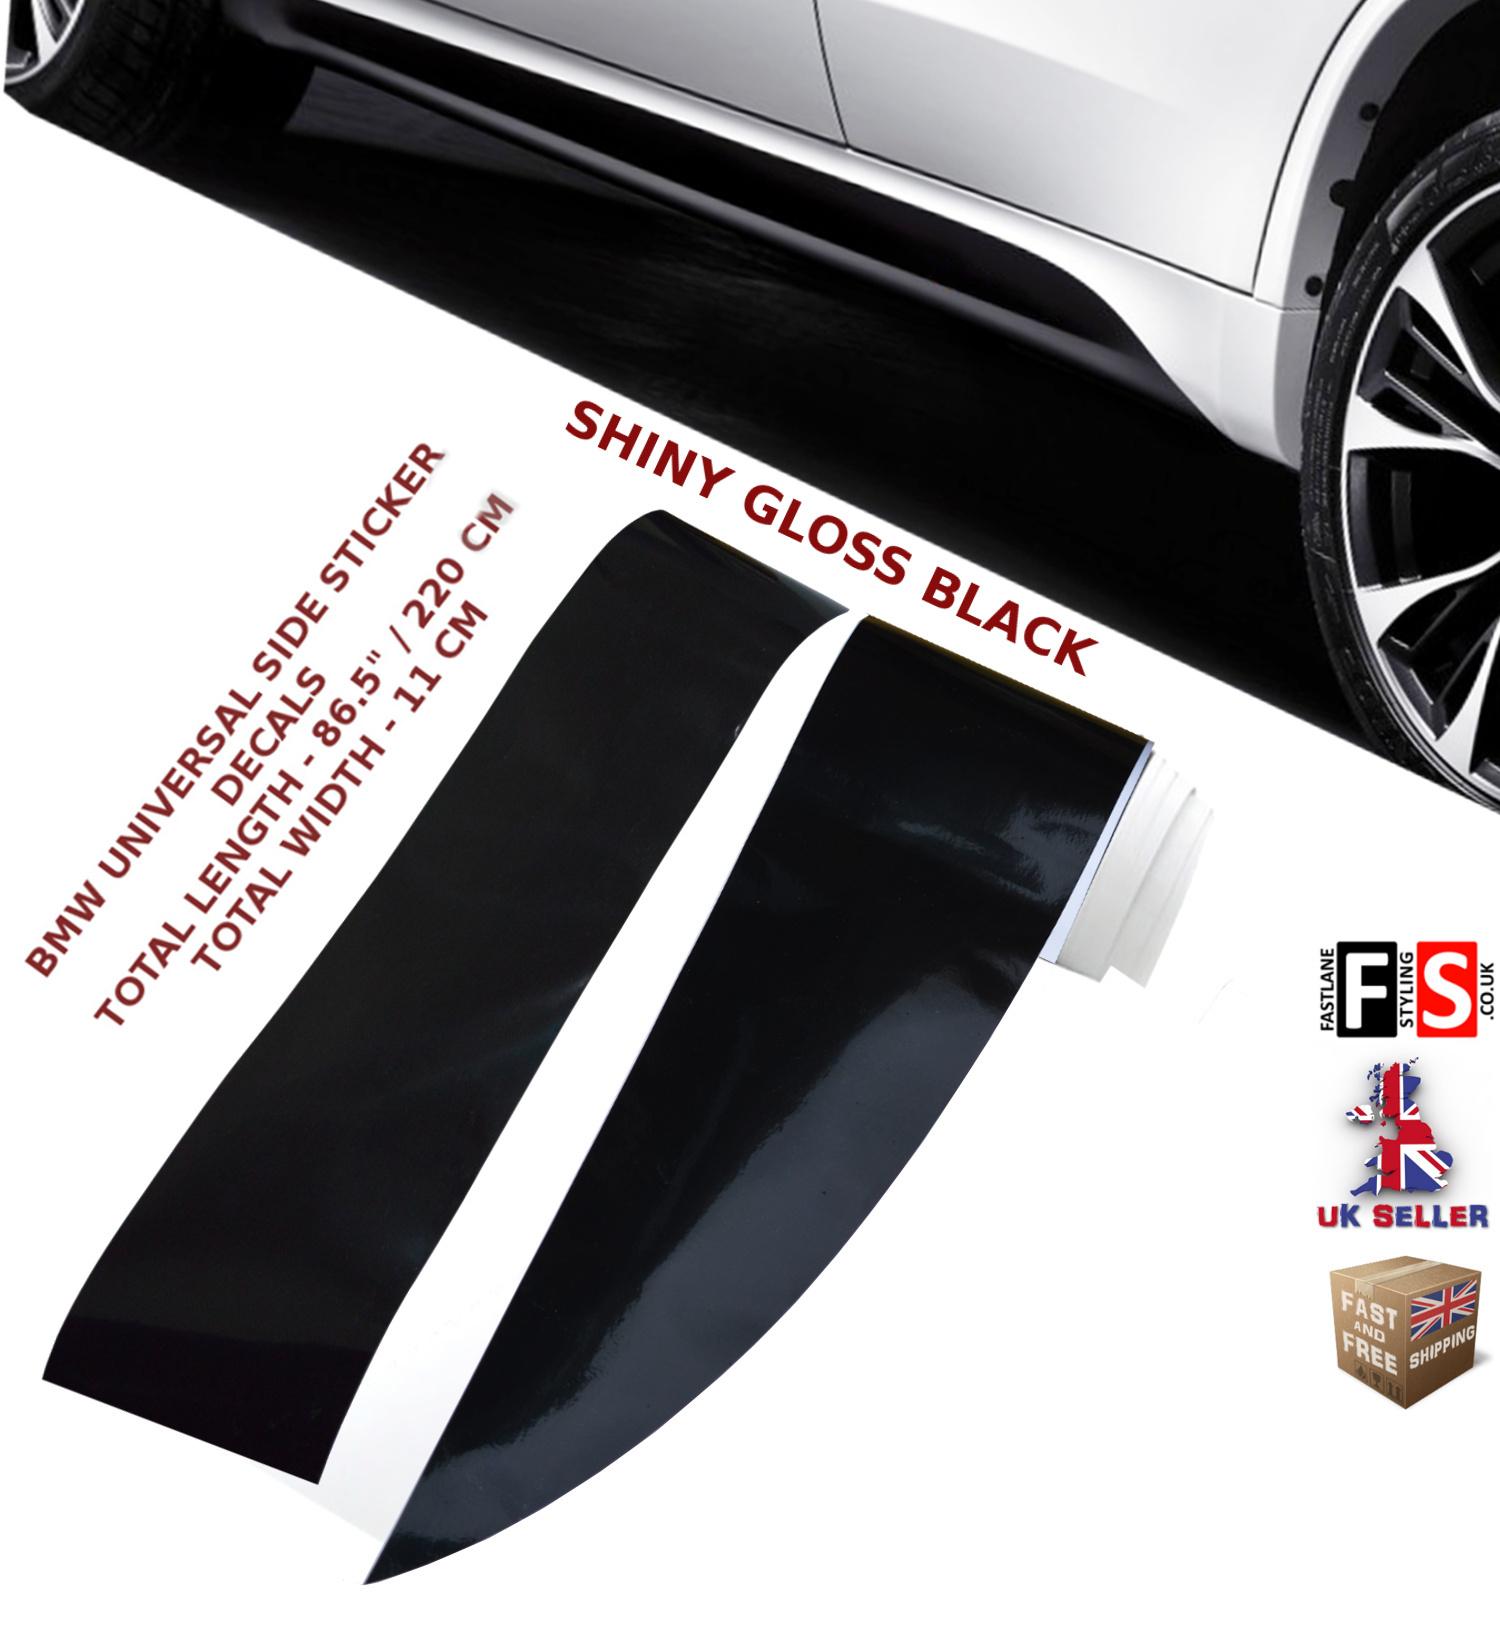 Details About Bmw 1 Series F20 F21 M Performance Side Sticker Skirts Decals Vinyl Gloss Black